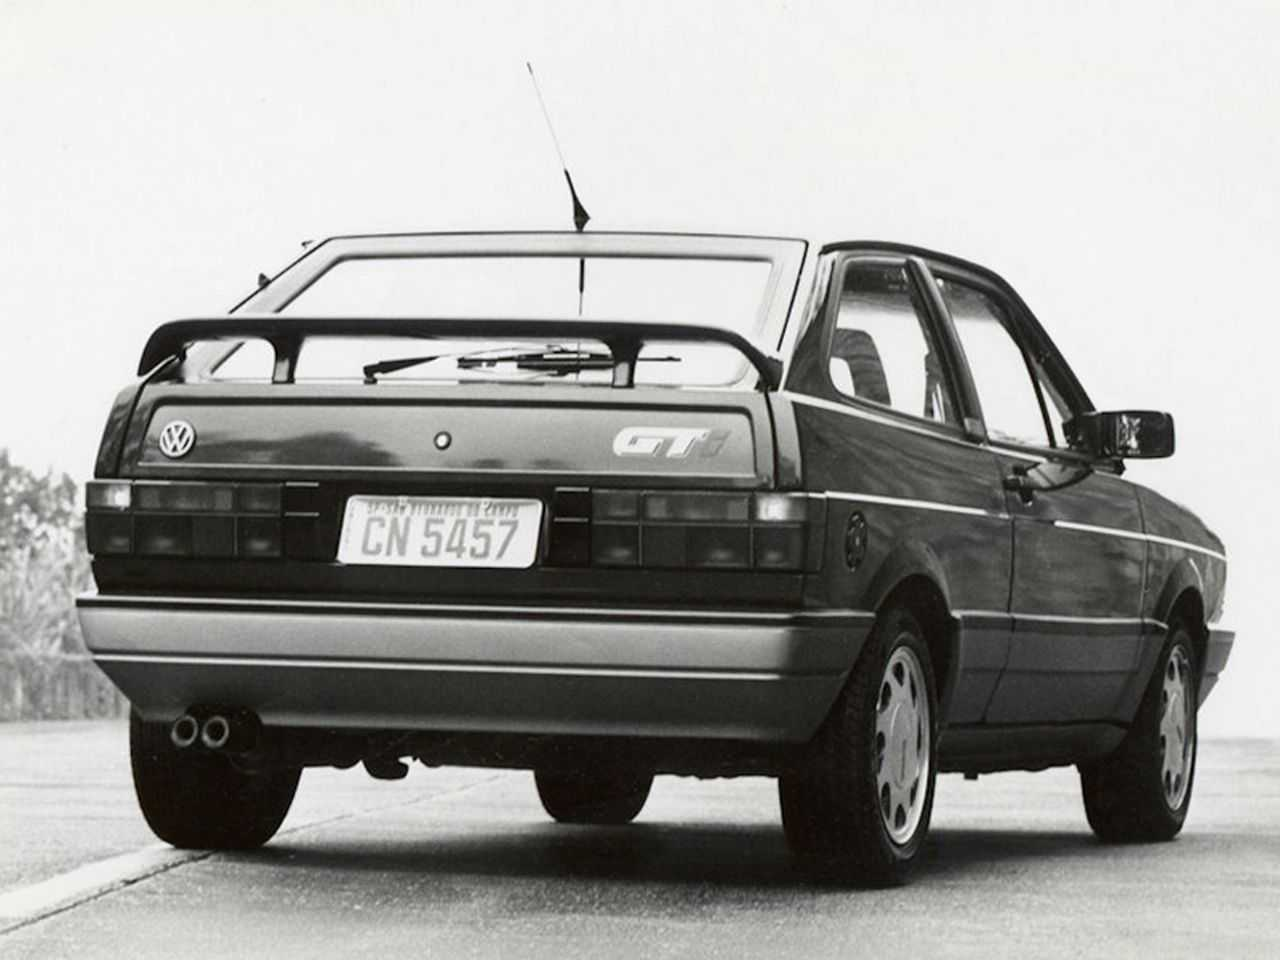 VolkswagenGol 1991 - ângulo traseiro